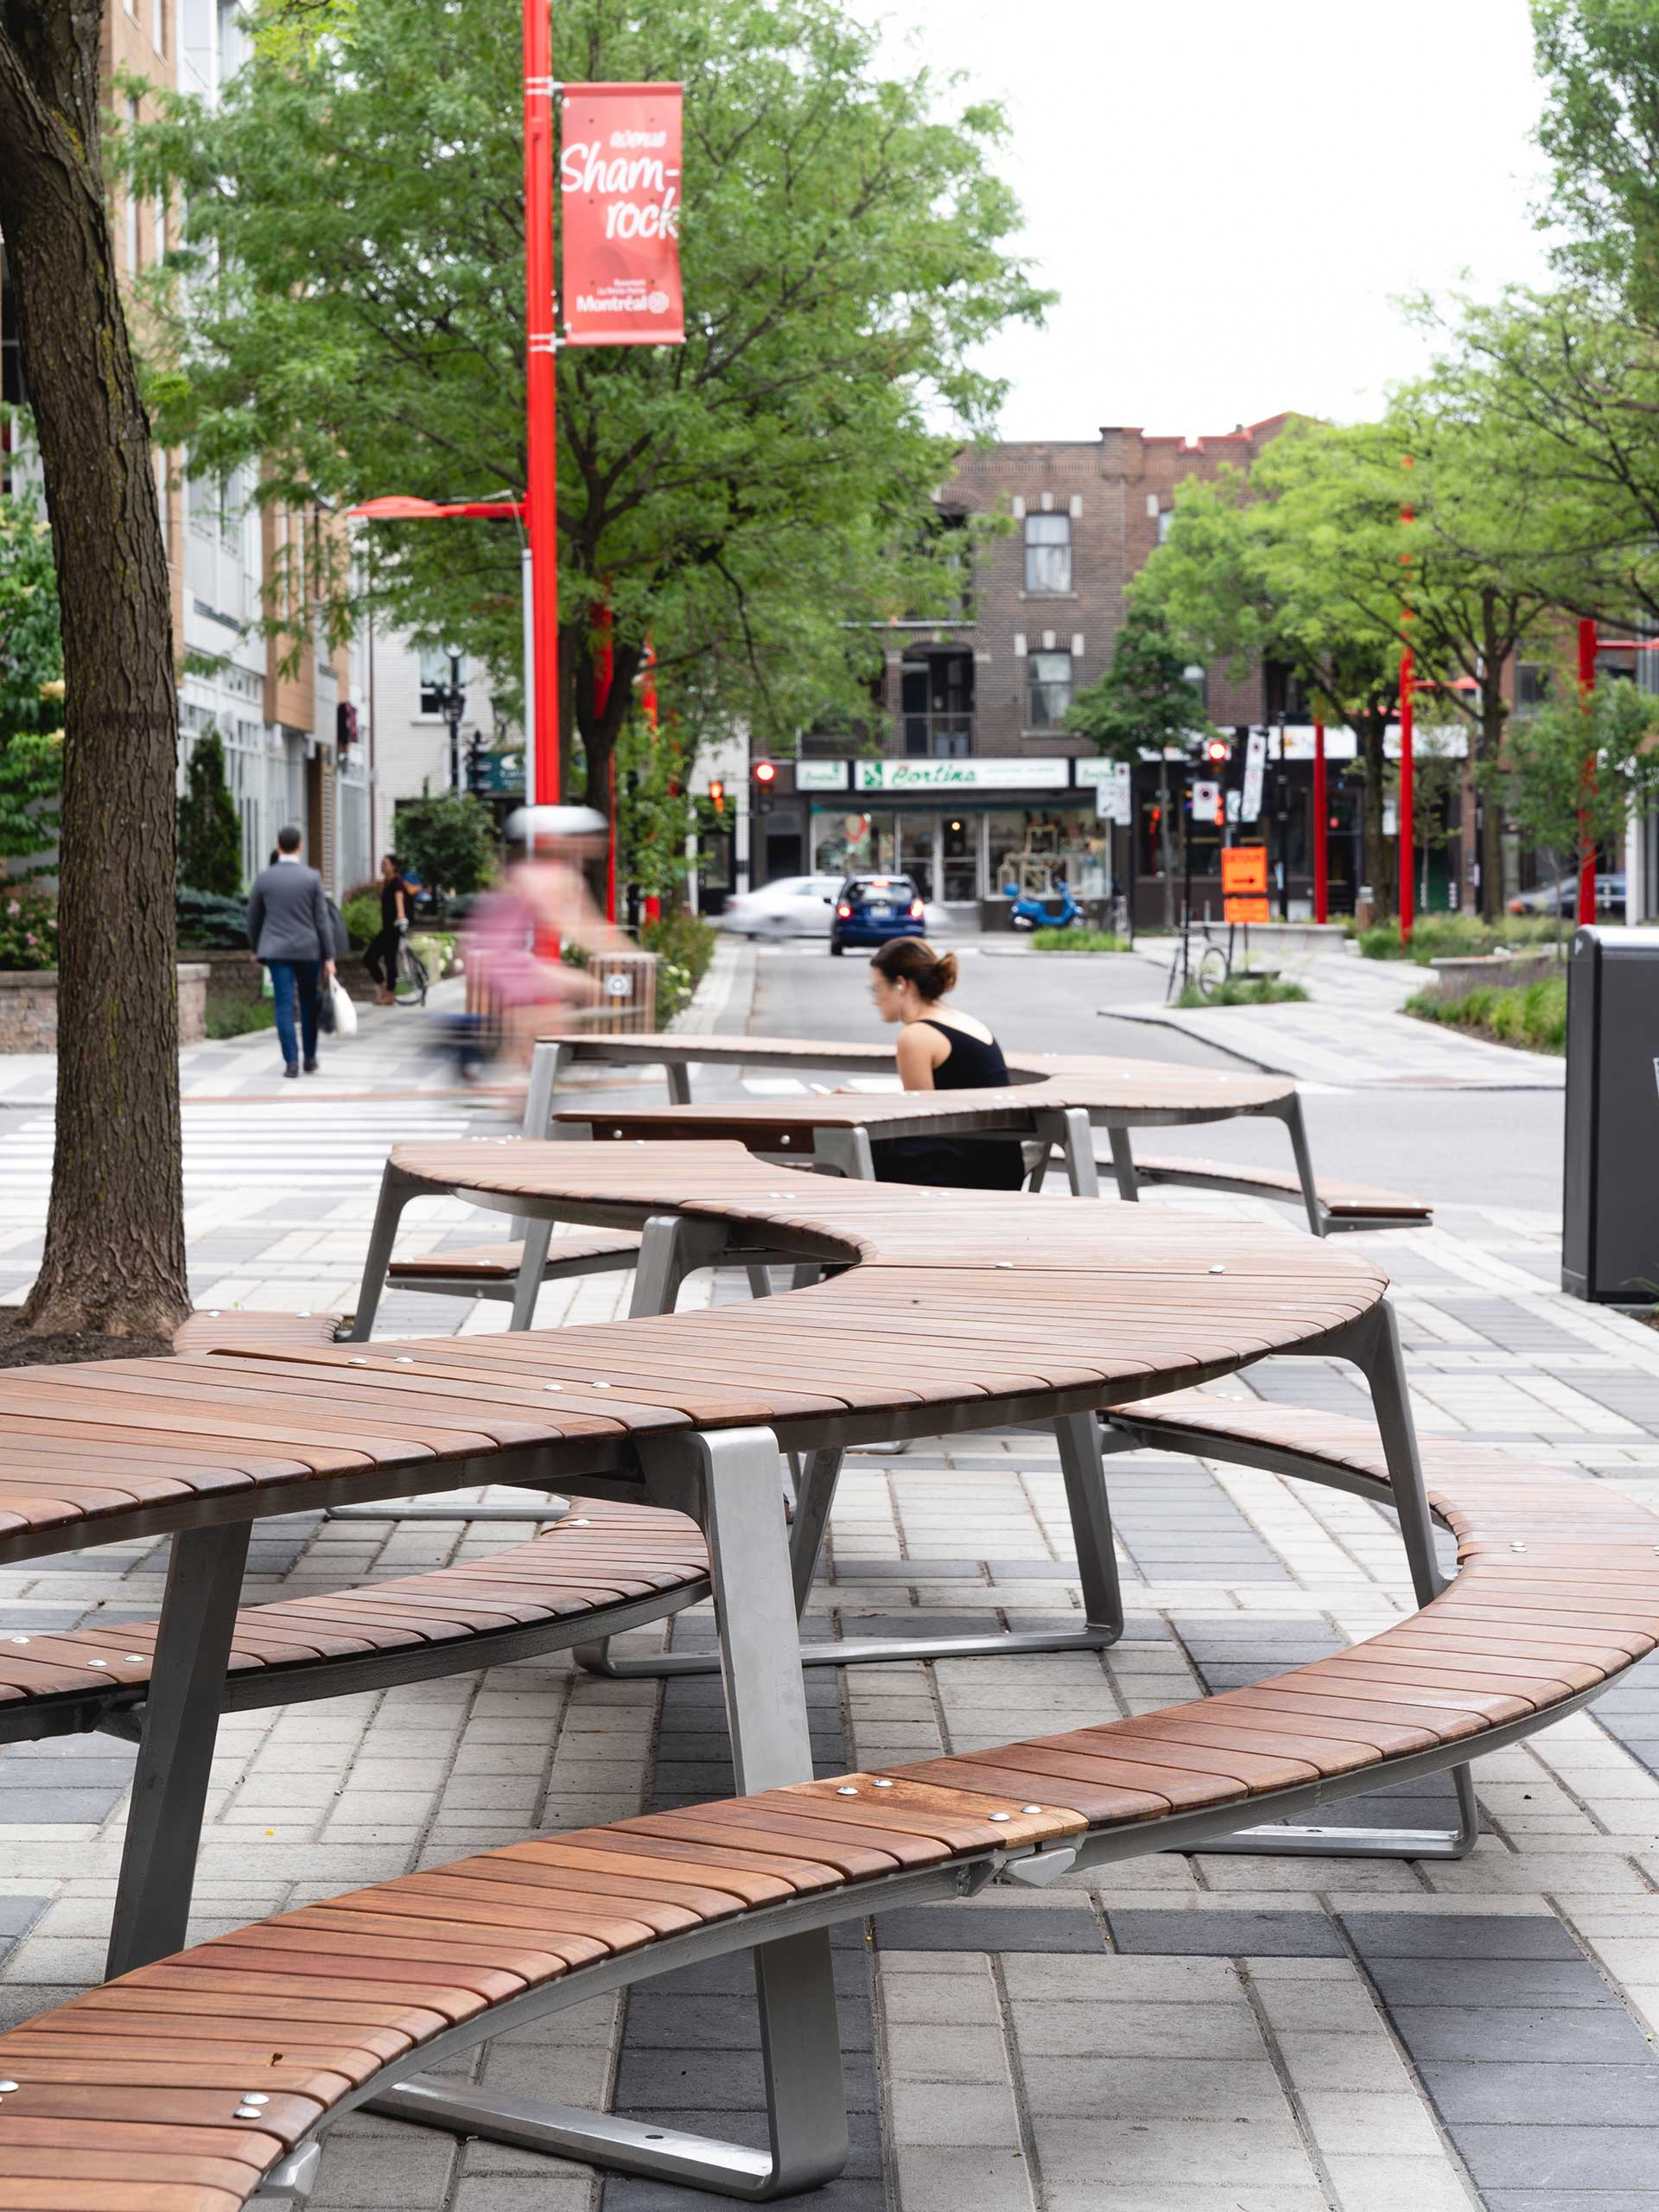 avenue shamrock table